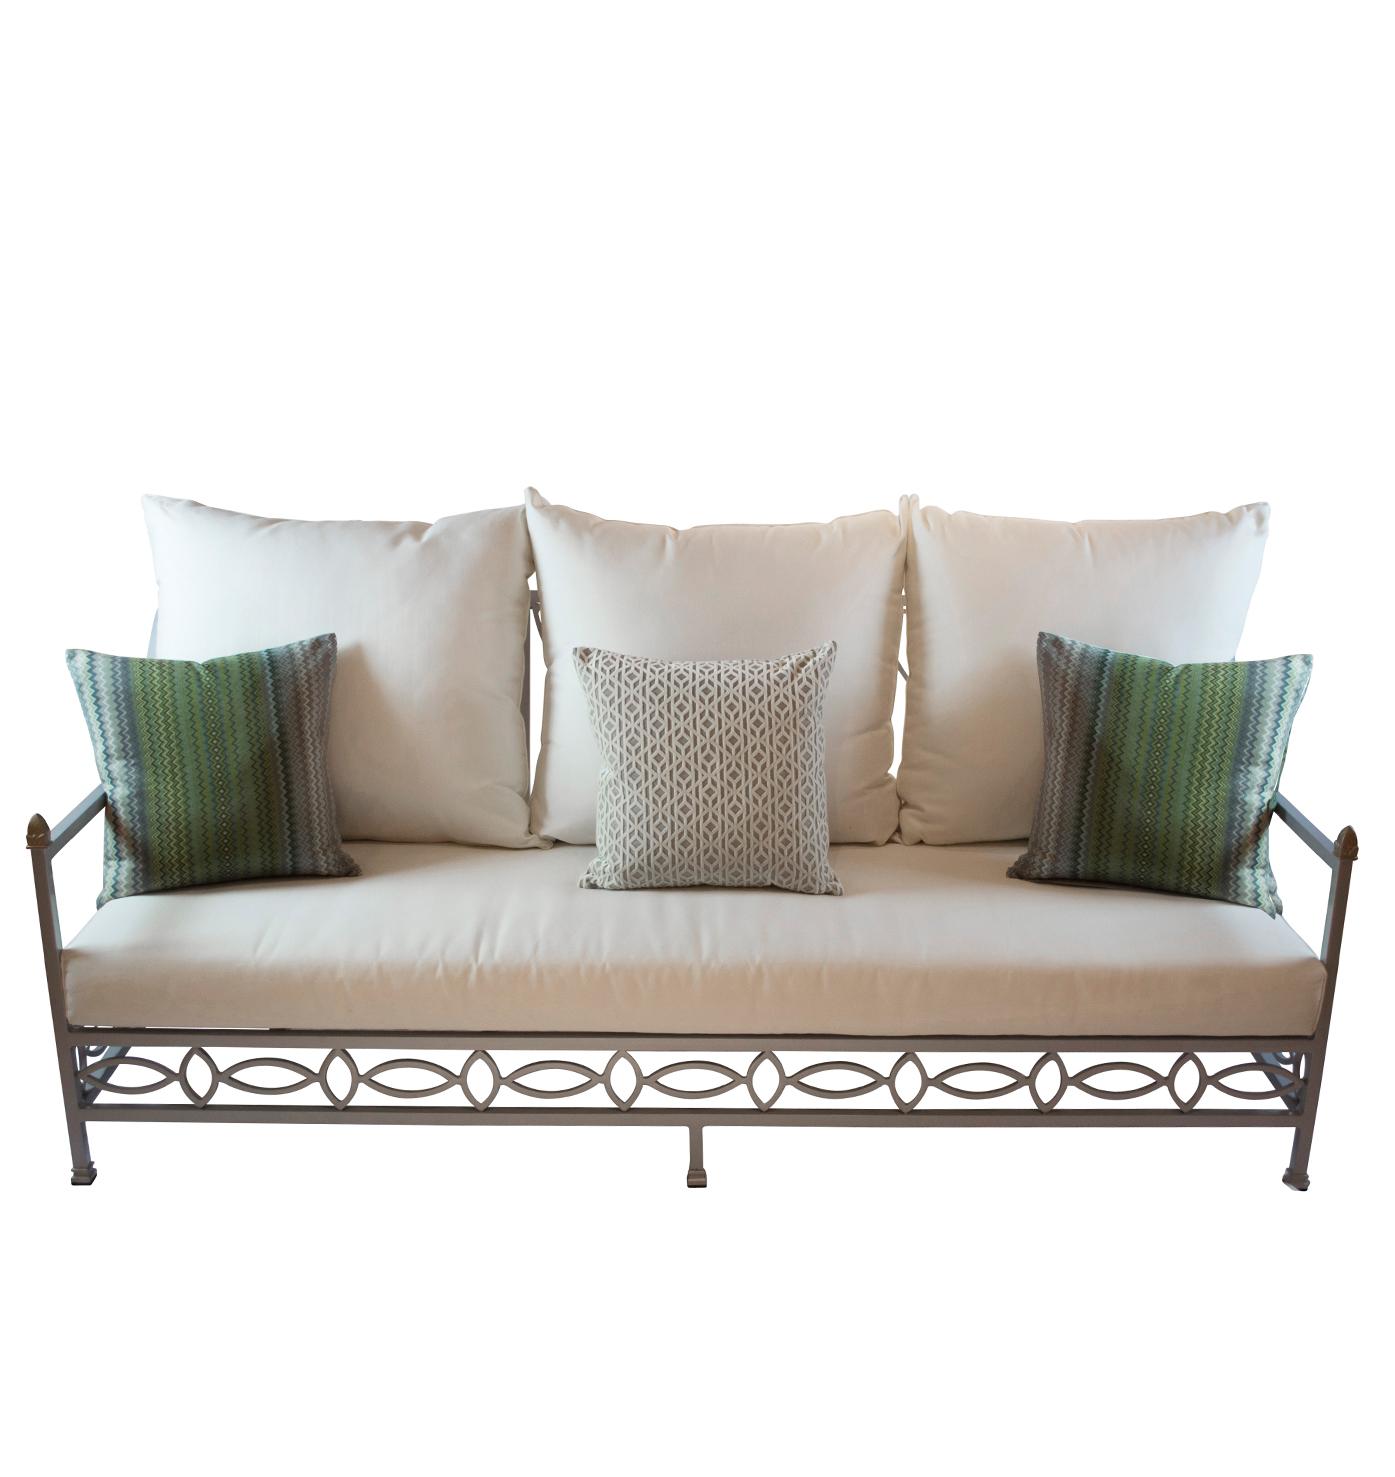 sullivan outdoor sofa UEDFMGO